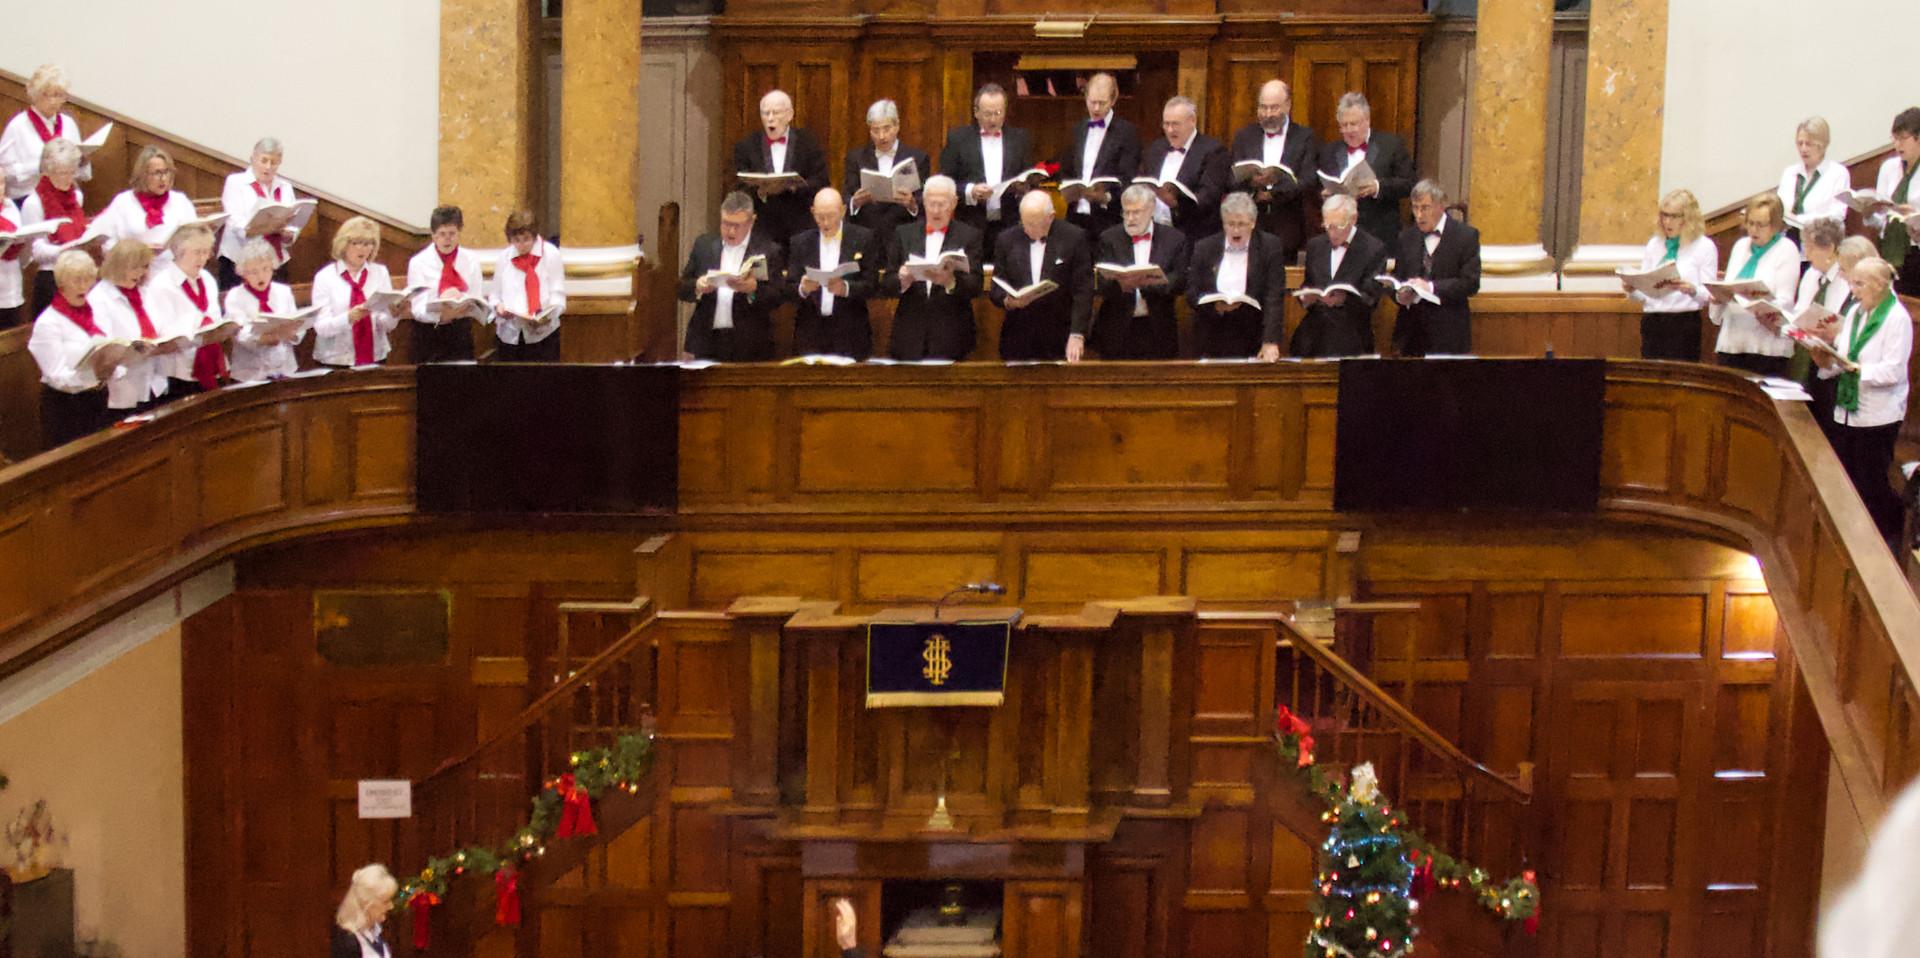 Grantham Choral 12.jpg